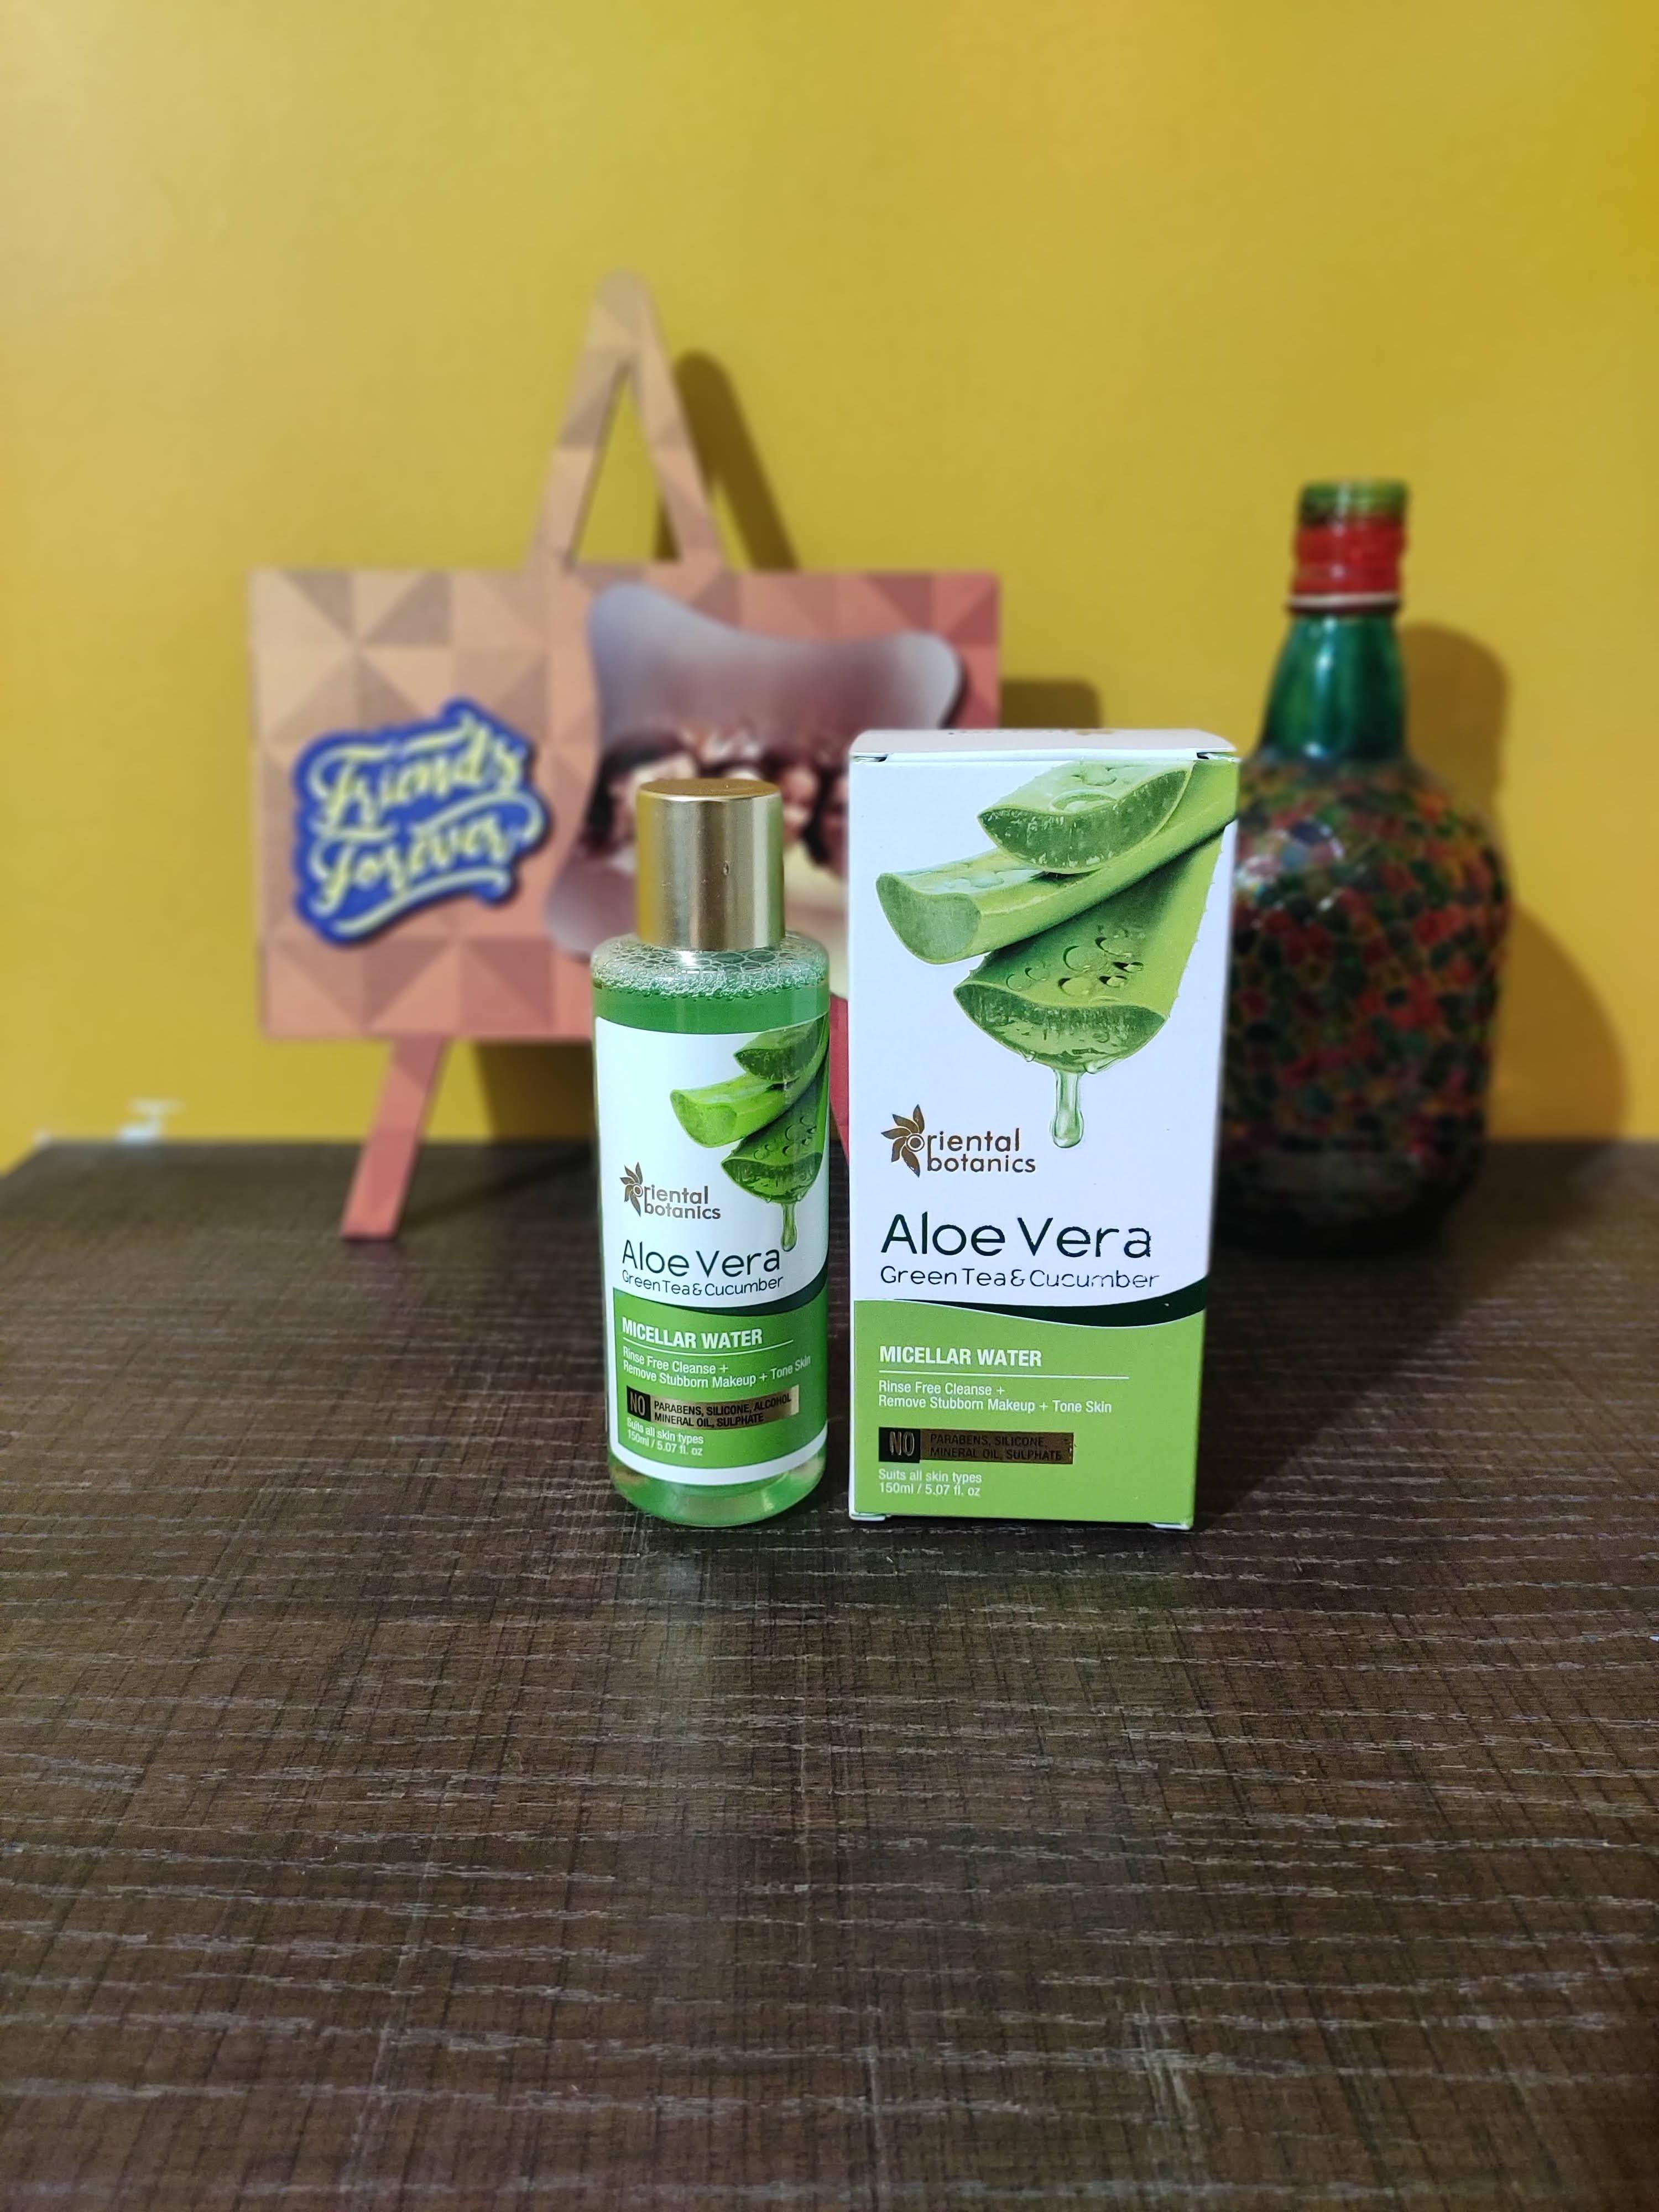 Oriental Botanics Aloe Vera, Green Tea & Cucumber Micellar Water-The best rinse-free natural makeup remover-By jaya_sathaye